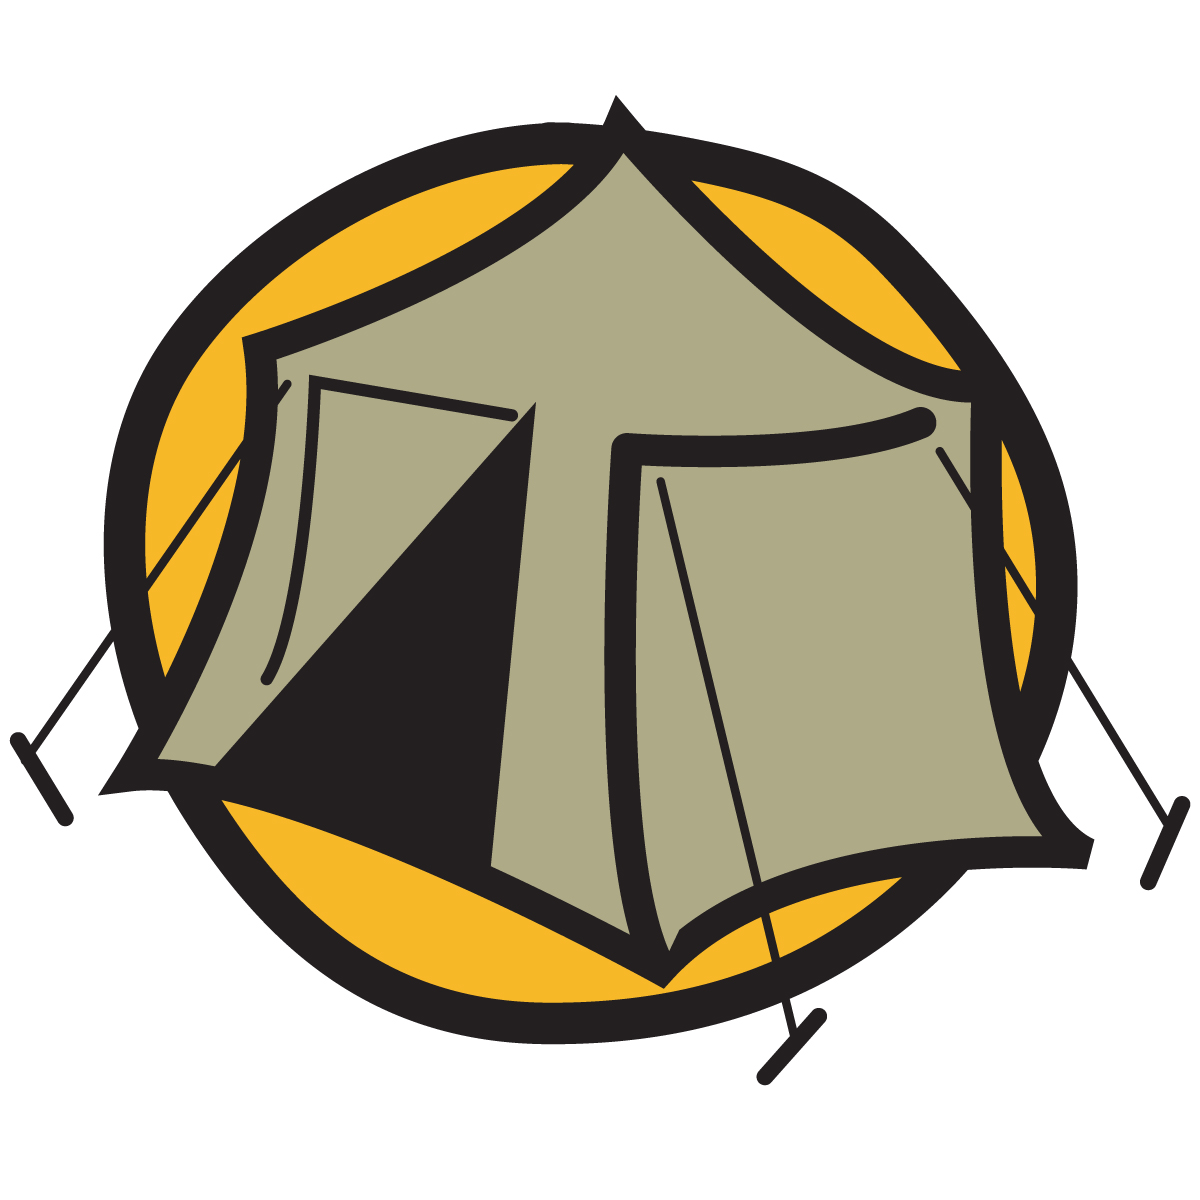 Camping logo clip art royalty free library Camping logo clip art - ClipartFest royalty free library